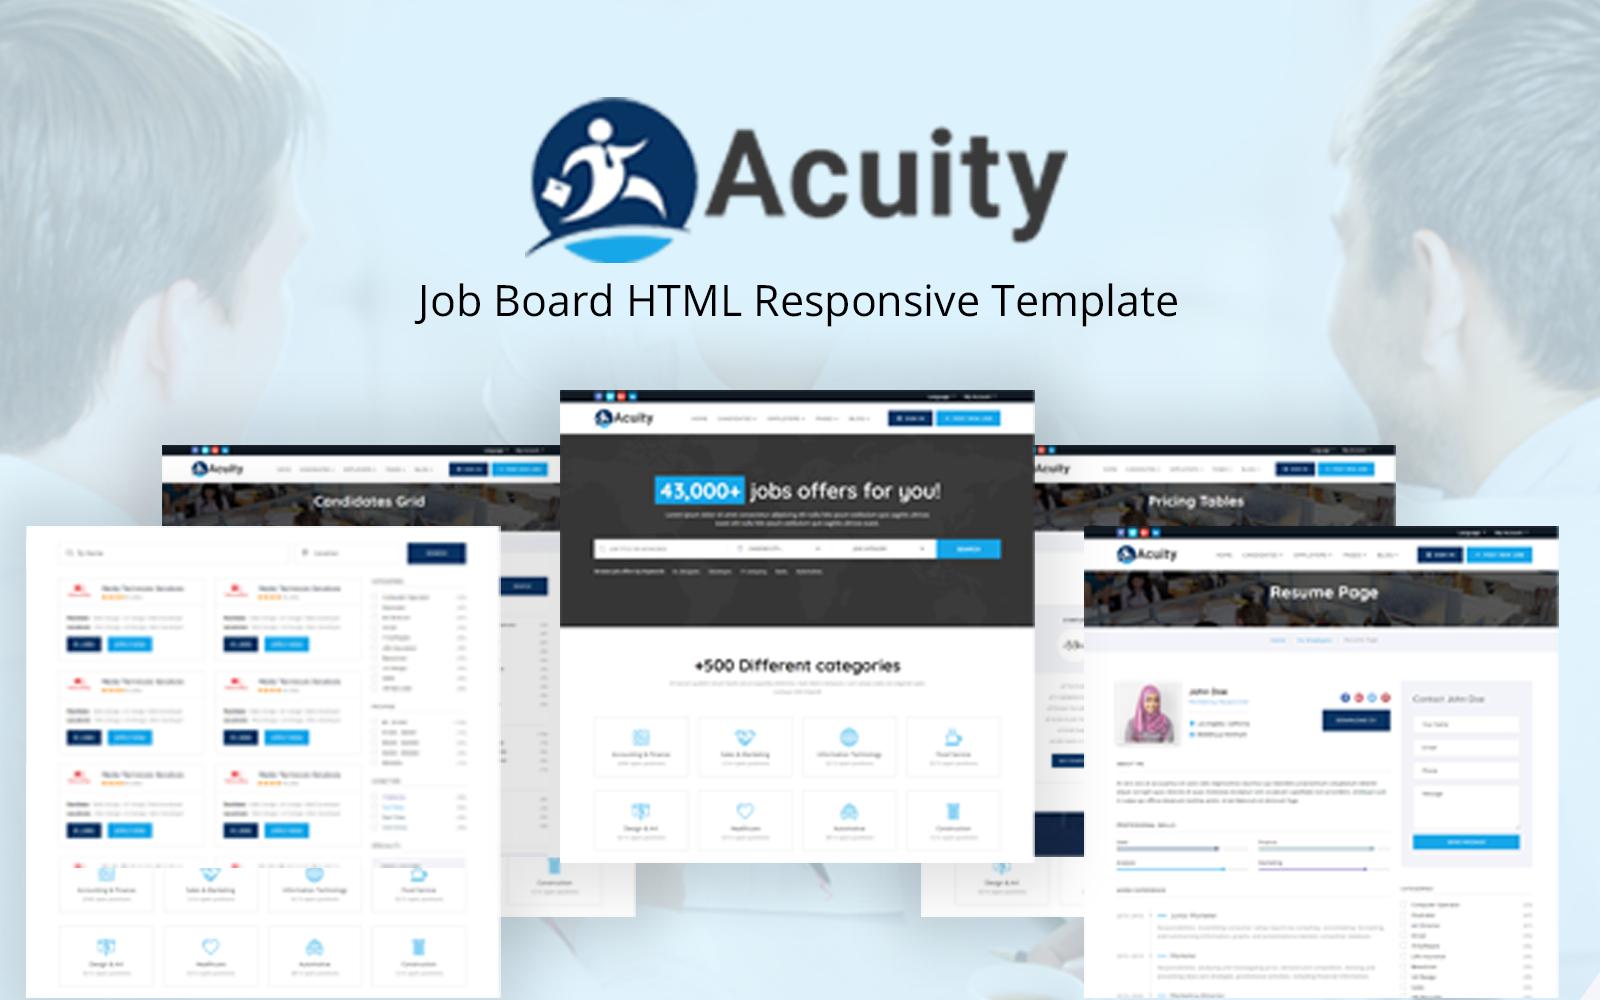 """Acuity - Job Board HTML Responsive"" modèle web adaptatif #117882"